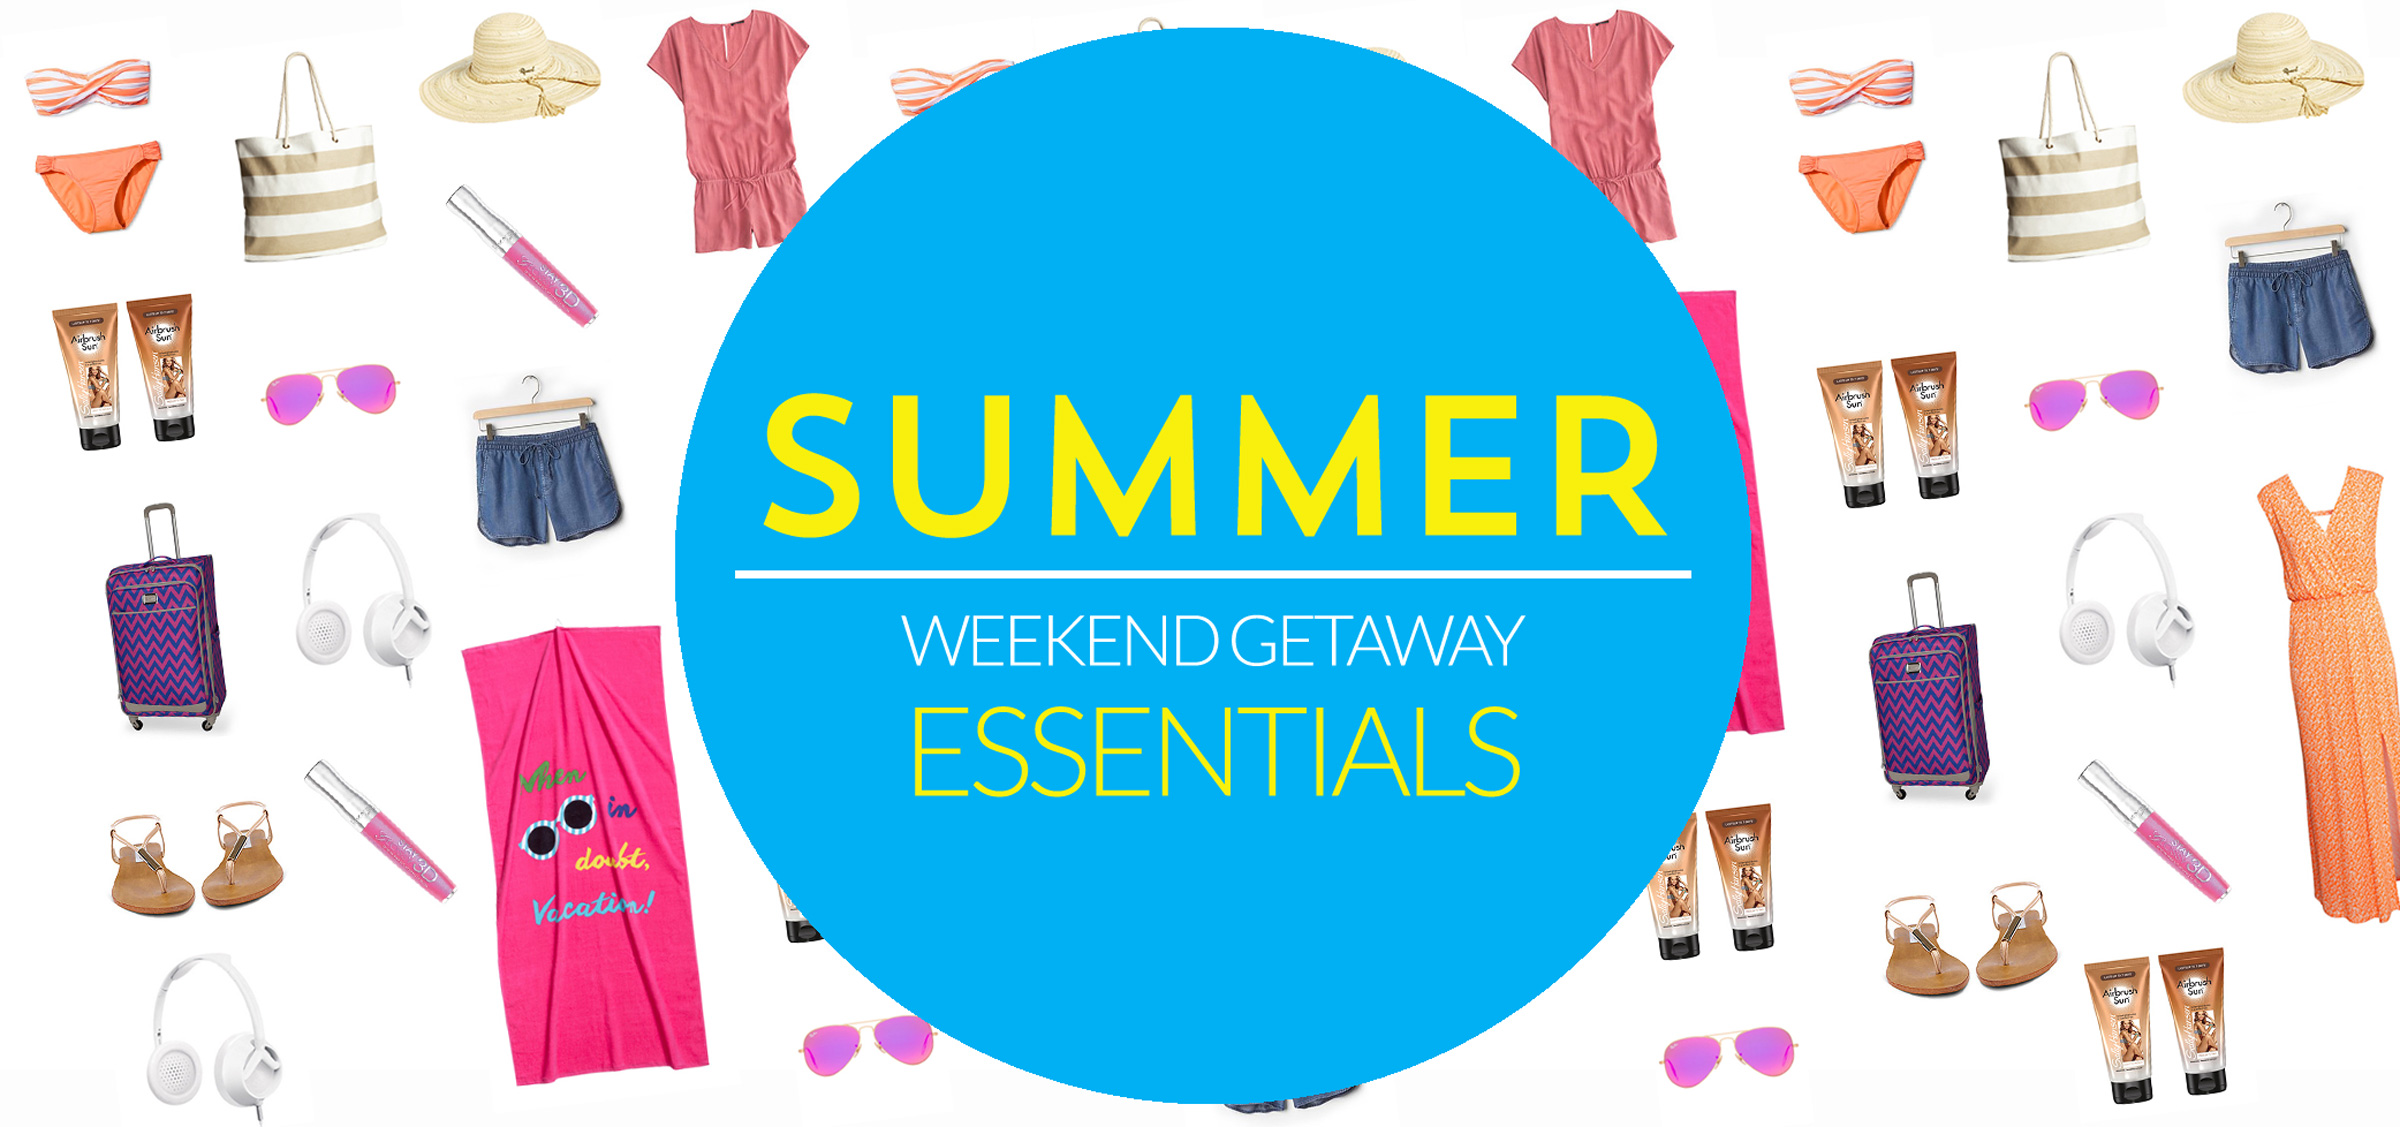 Summer-Weekend-Getaway-Essentials-2400px